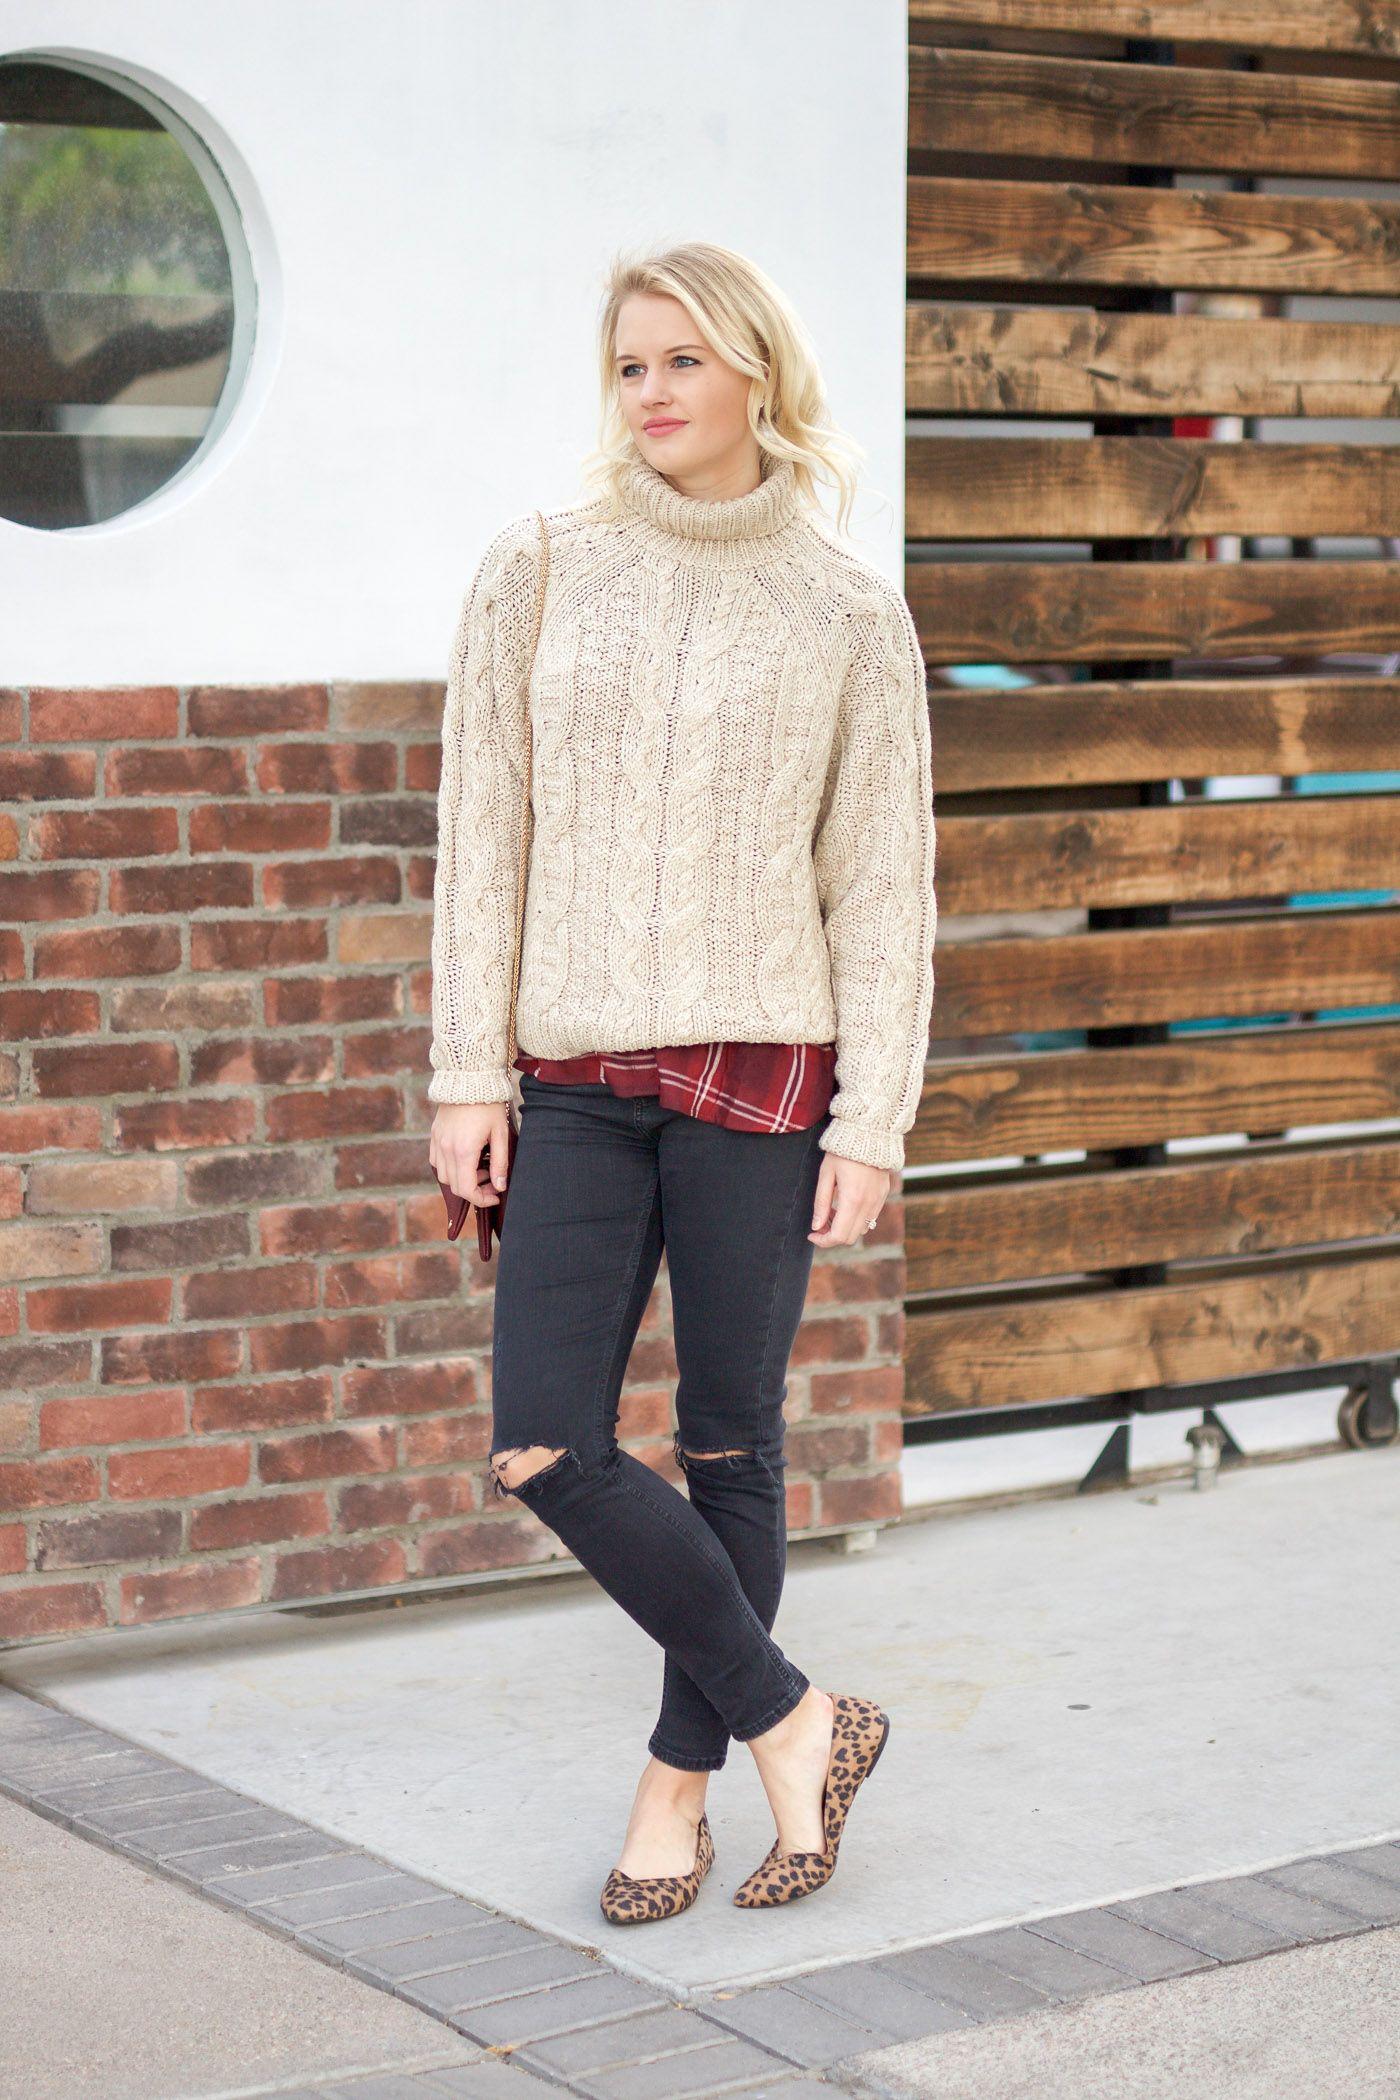 Oversized Sweaters   Treats & Trends